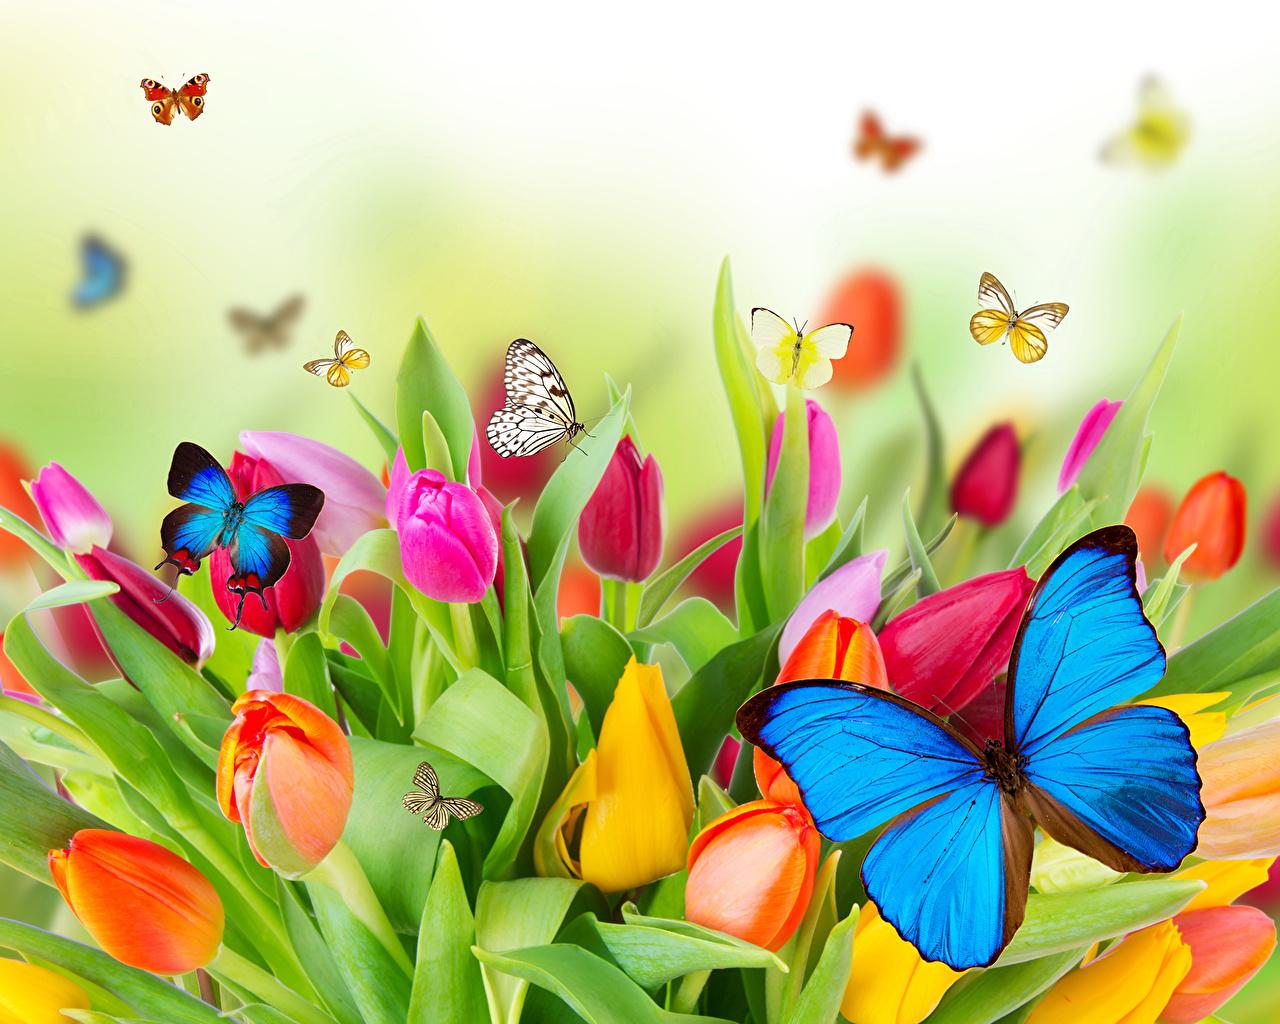 Fotografias De Mariposas Y Flores: Papeis De Parede Tulipas Lepidoptera Folhagem Flores